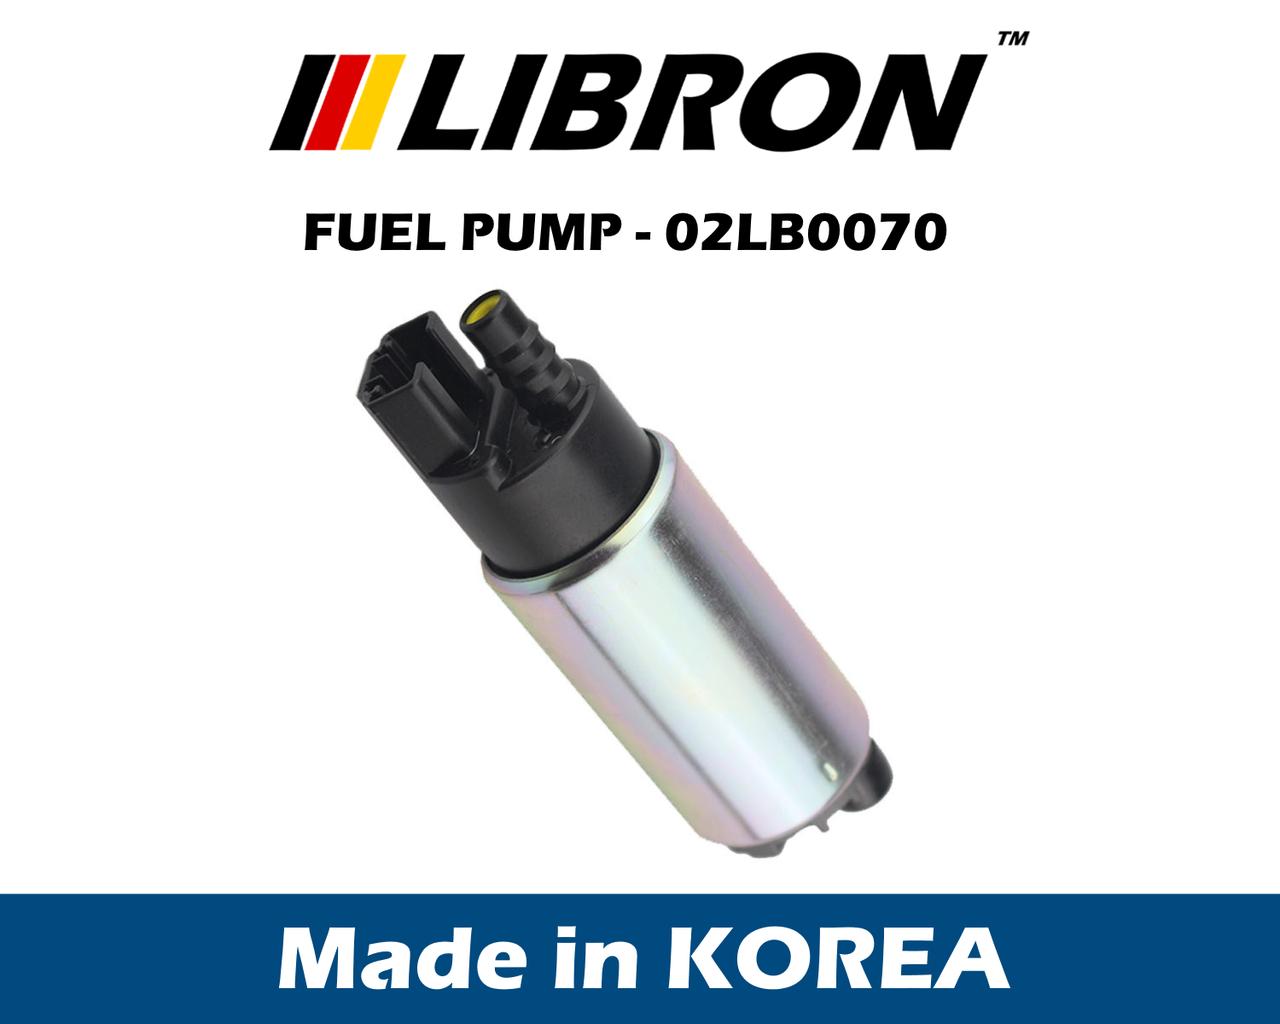 Топливный насос LIBRON 02LB0070 - SUZUKI JIMNY (2001-...)